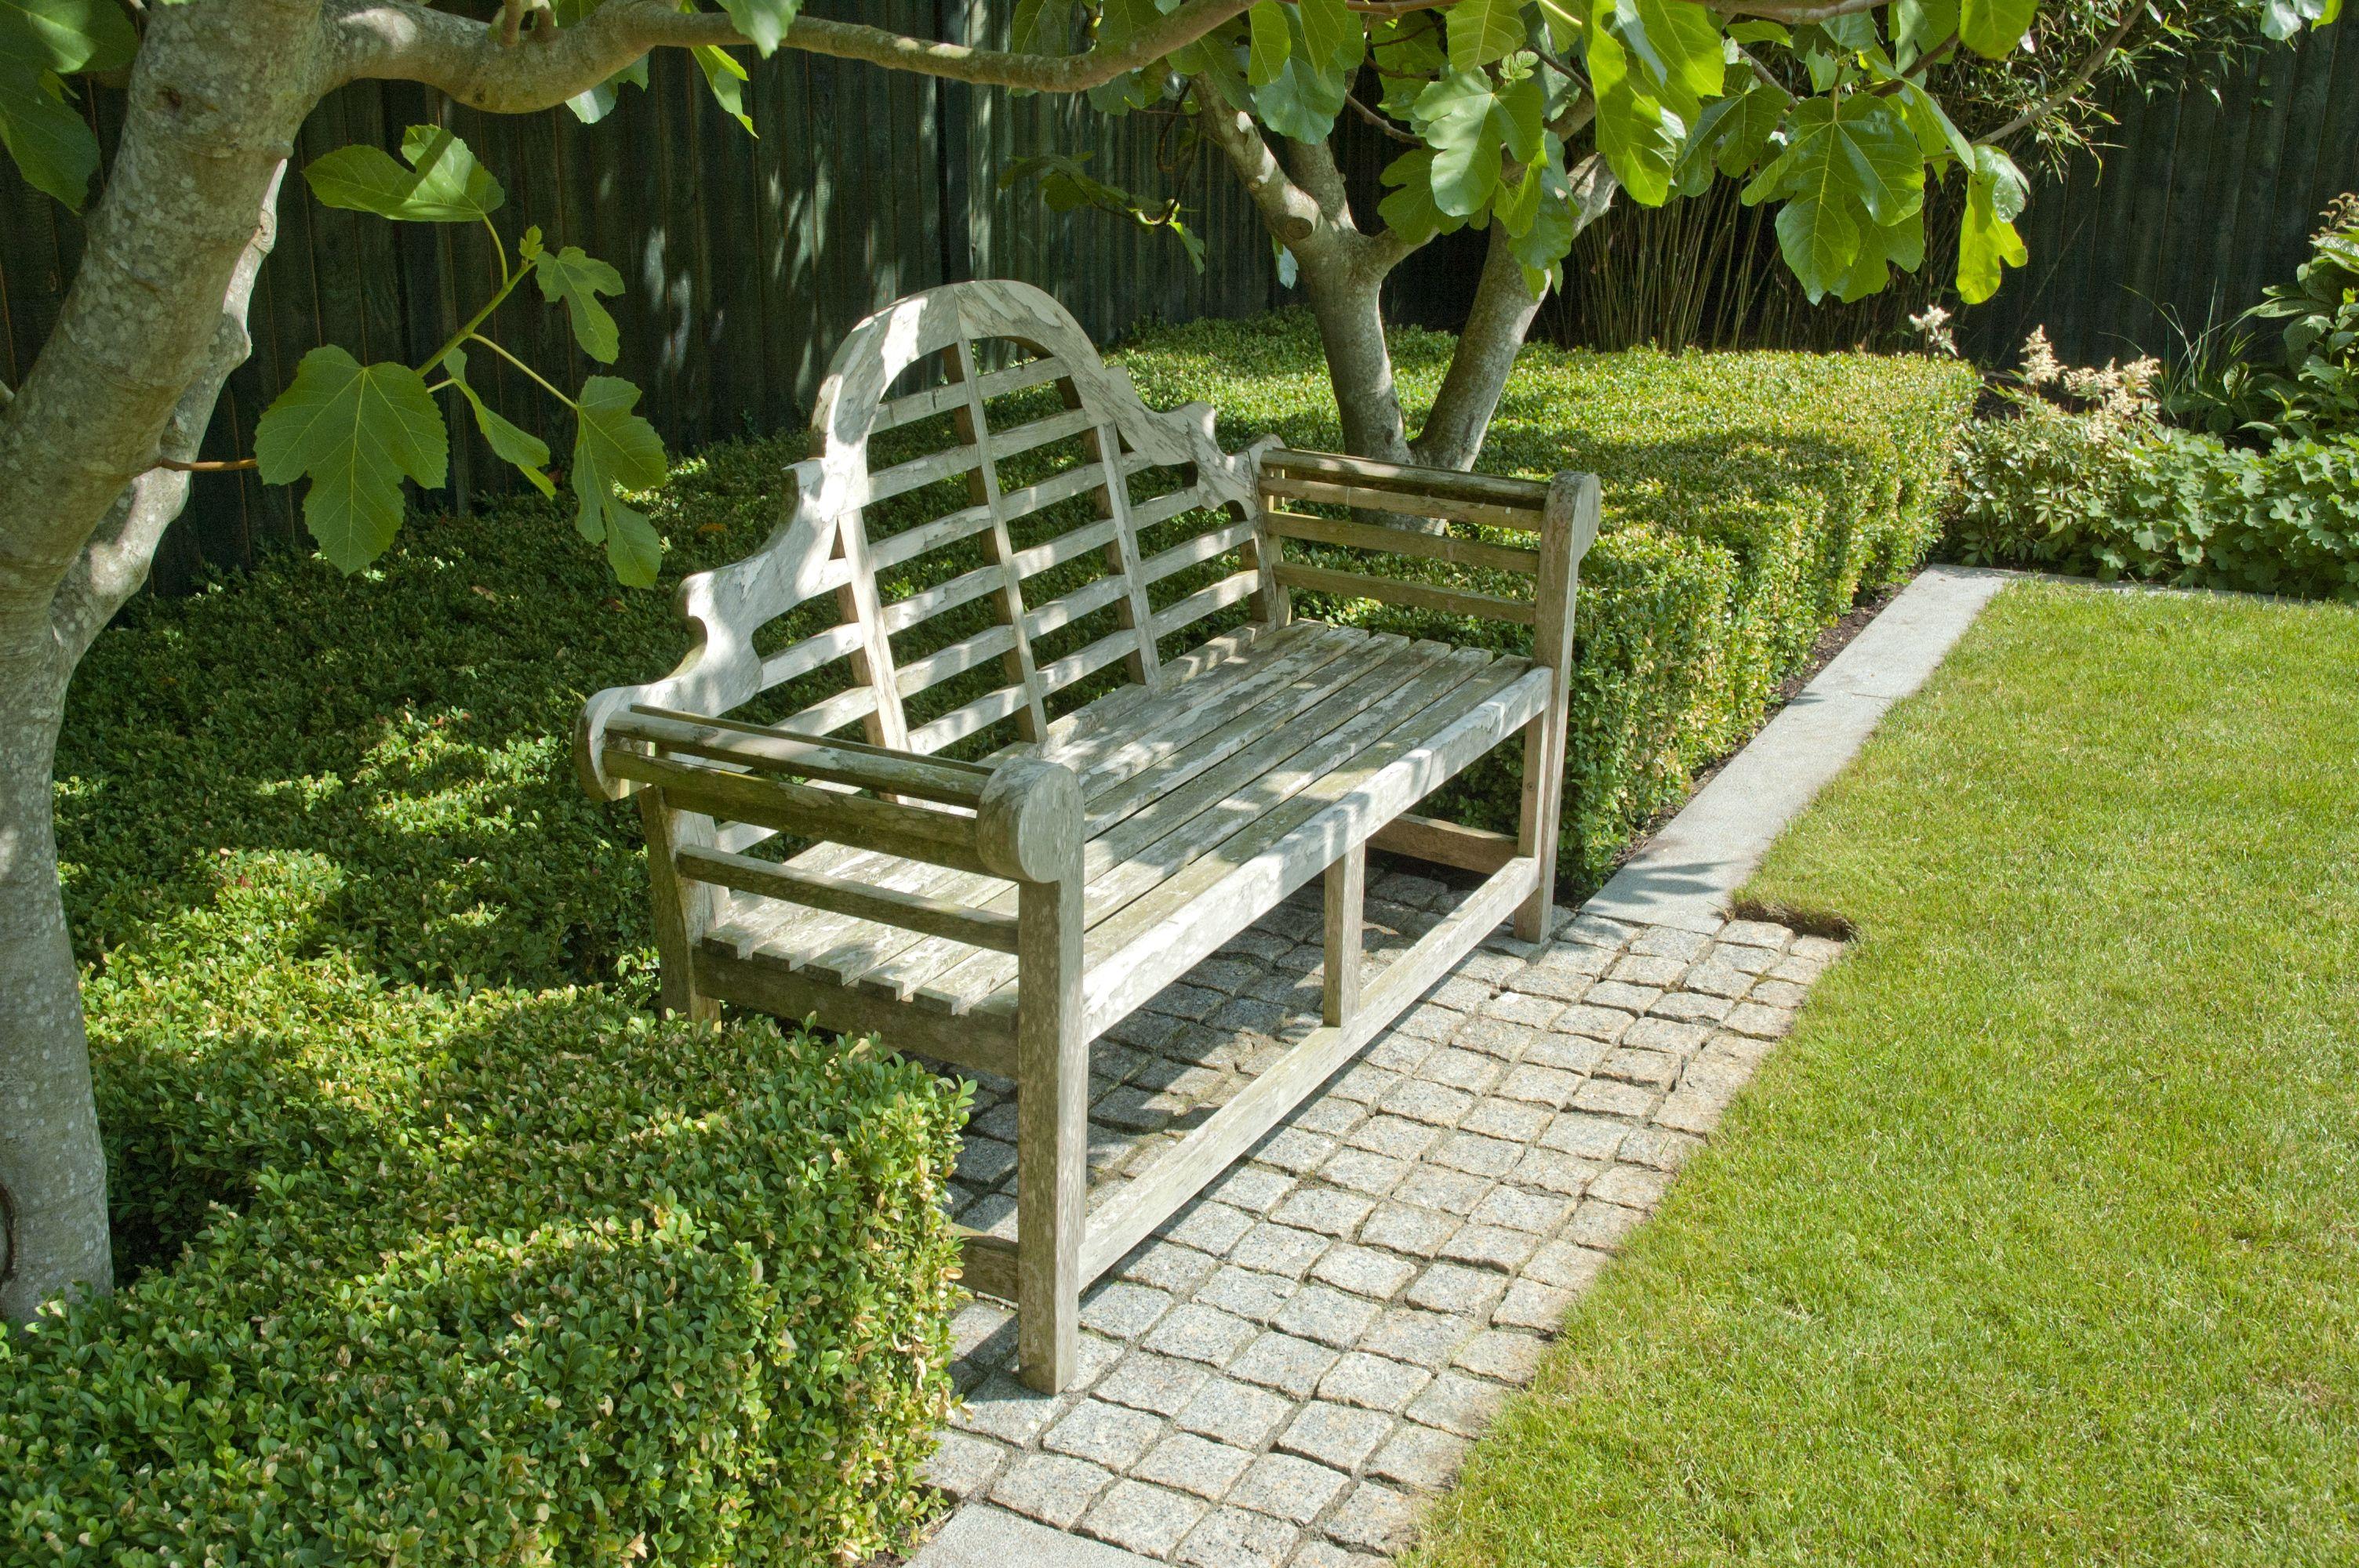 Clipped Hedge Surrounds Bench Garden Design Garden Design Plans Garden Maintenance